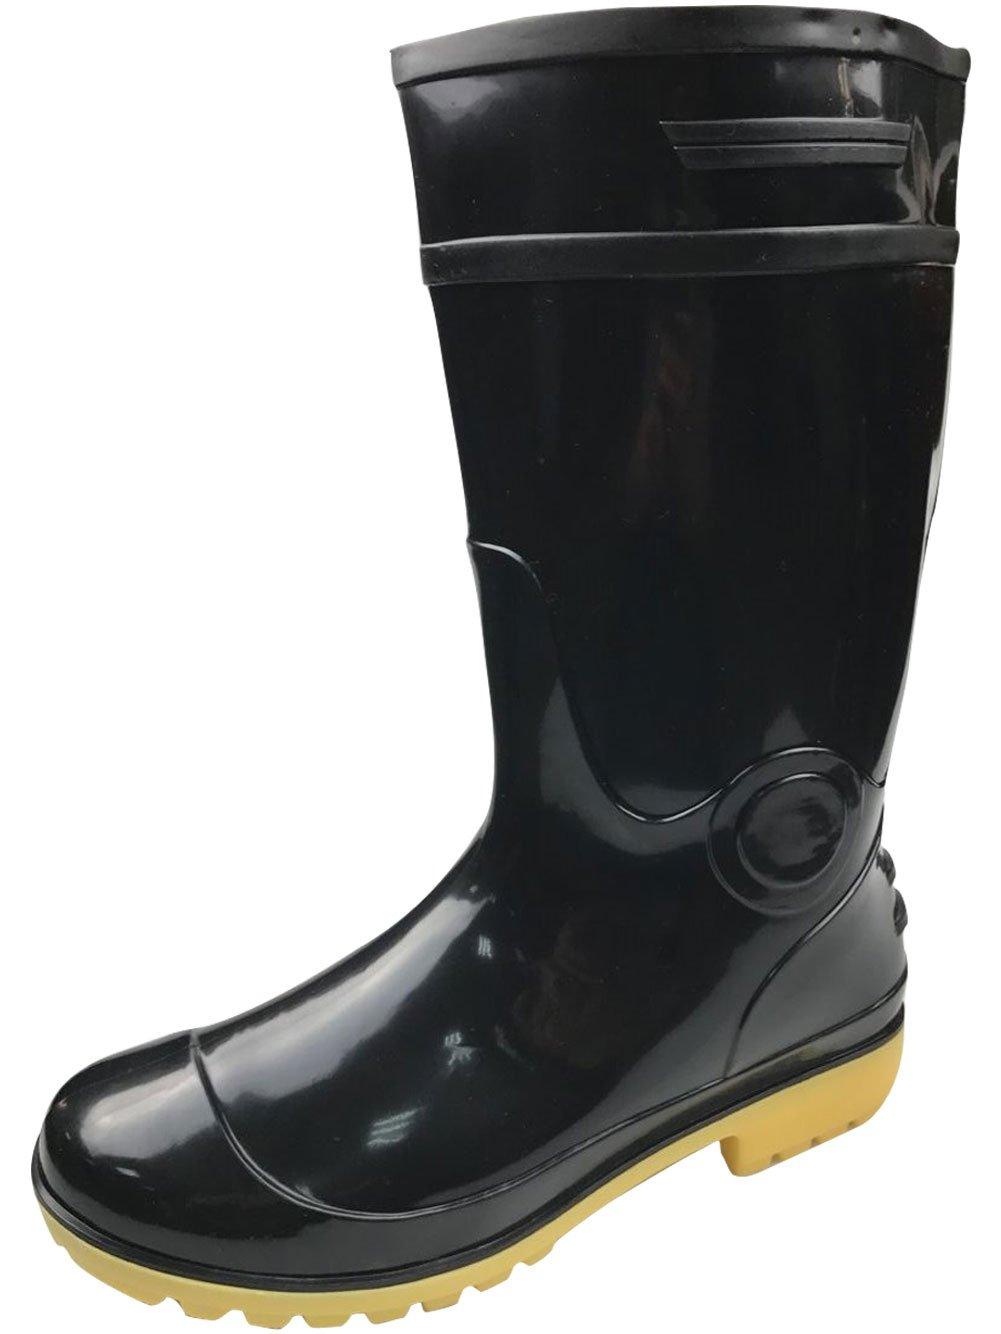 Adult Men's Antiskid Waterproof Rubber Sole Work Shoes Rain Boots (8.5)